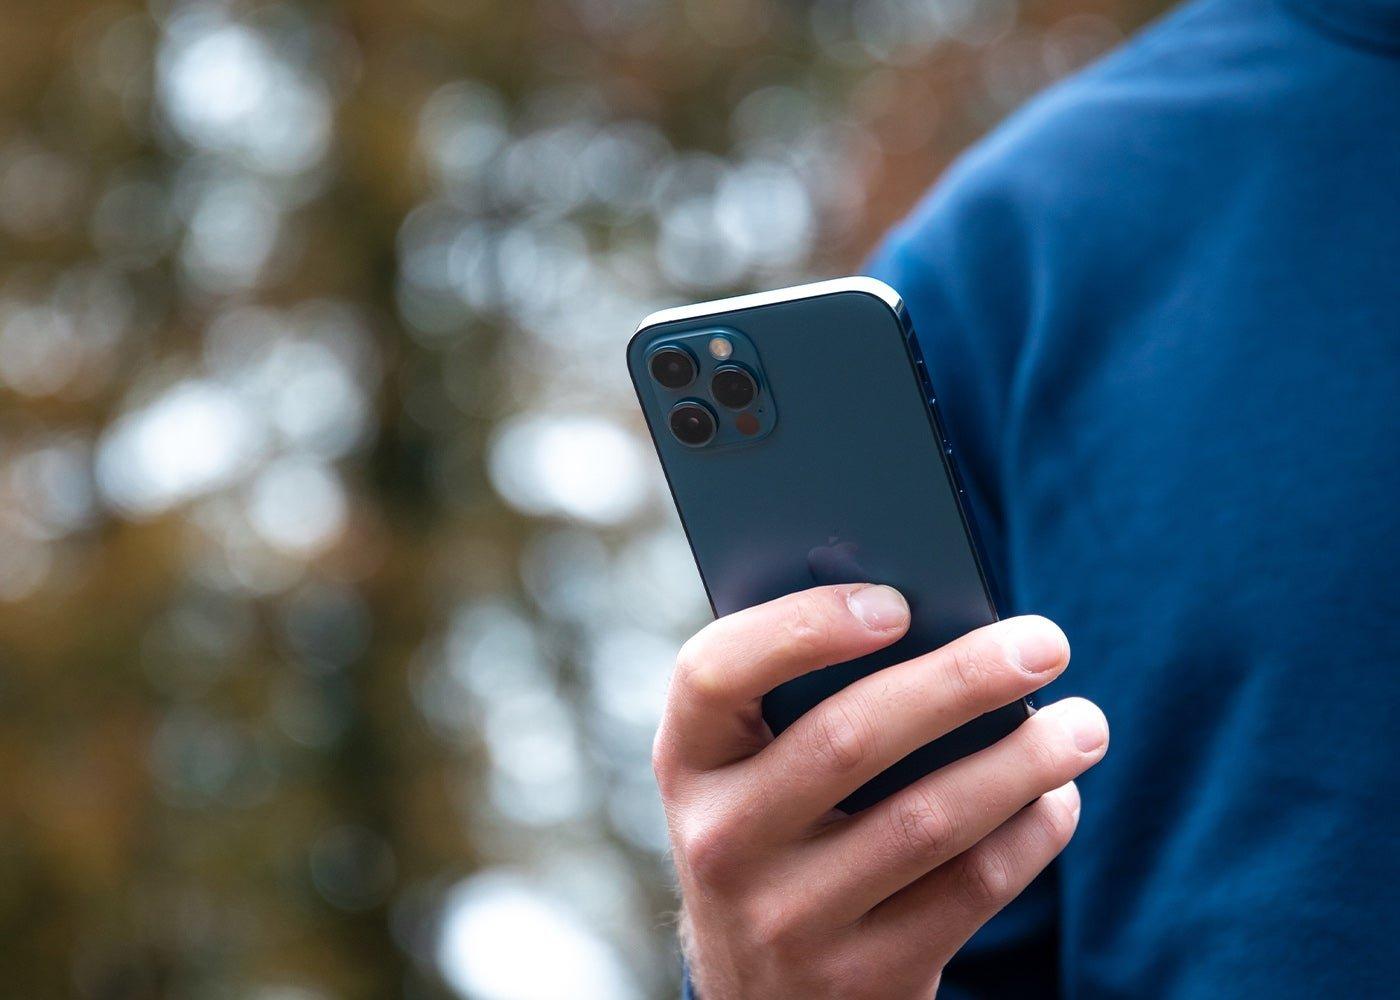 आईफोन 12 प्रो ब्लू